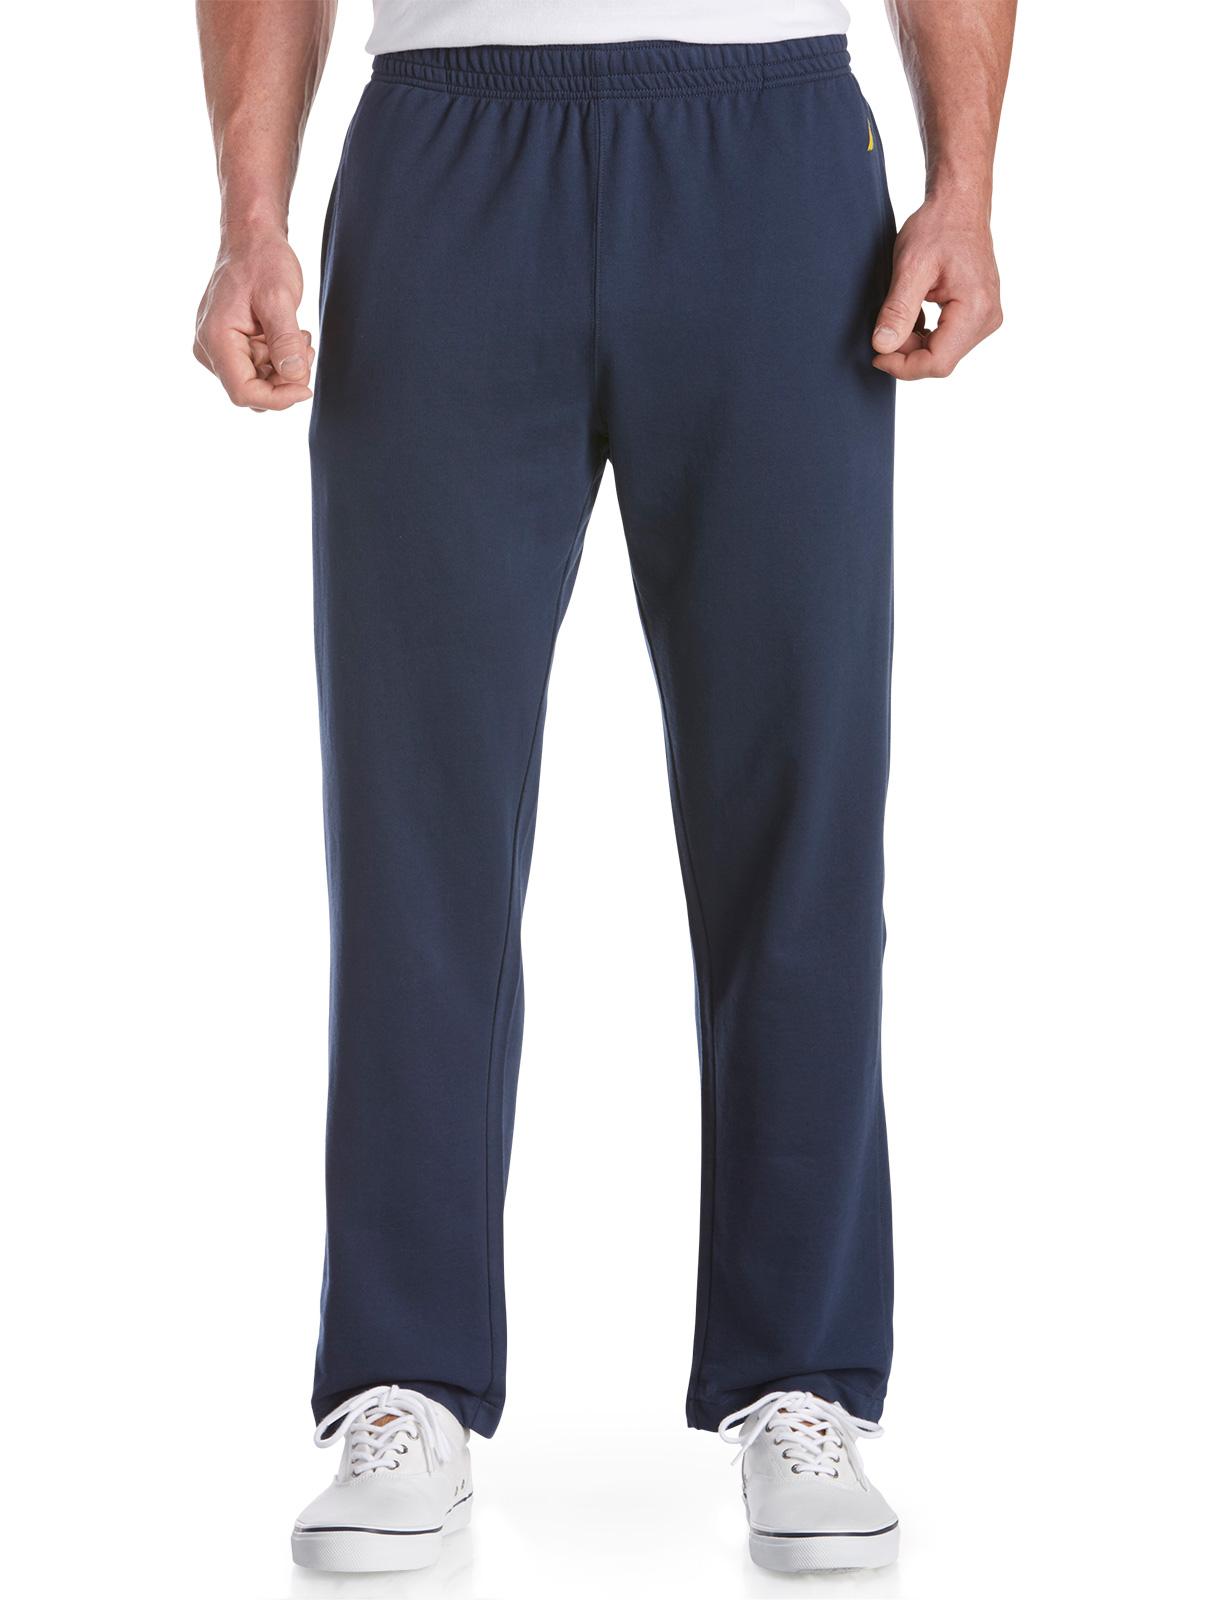 Nautica Men's Big and Tall Knit Pants